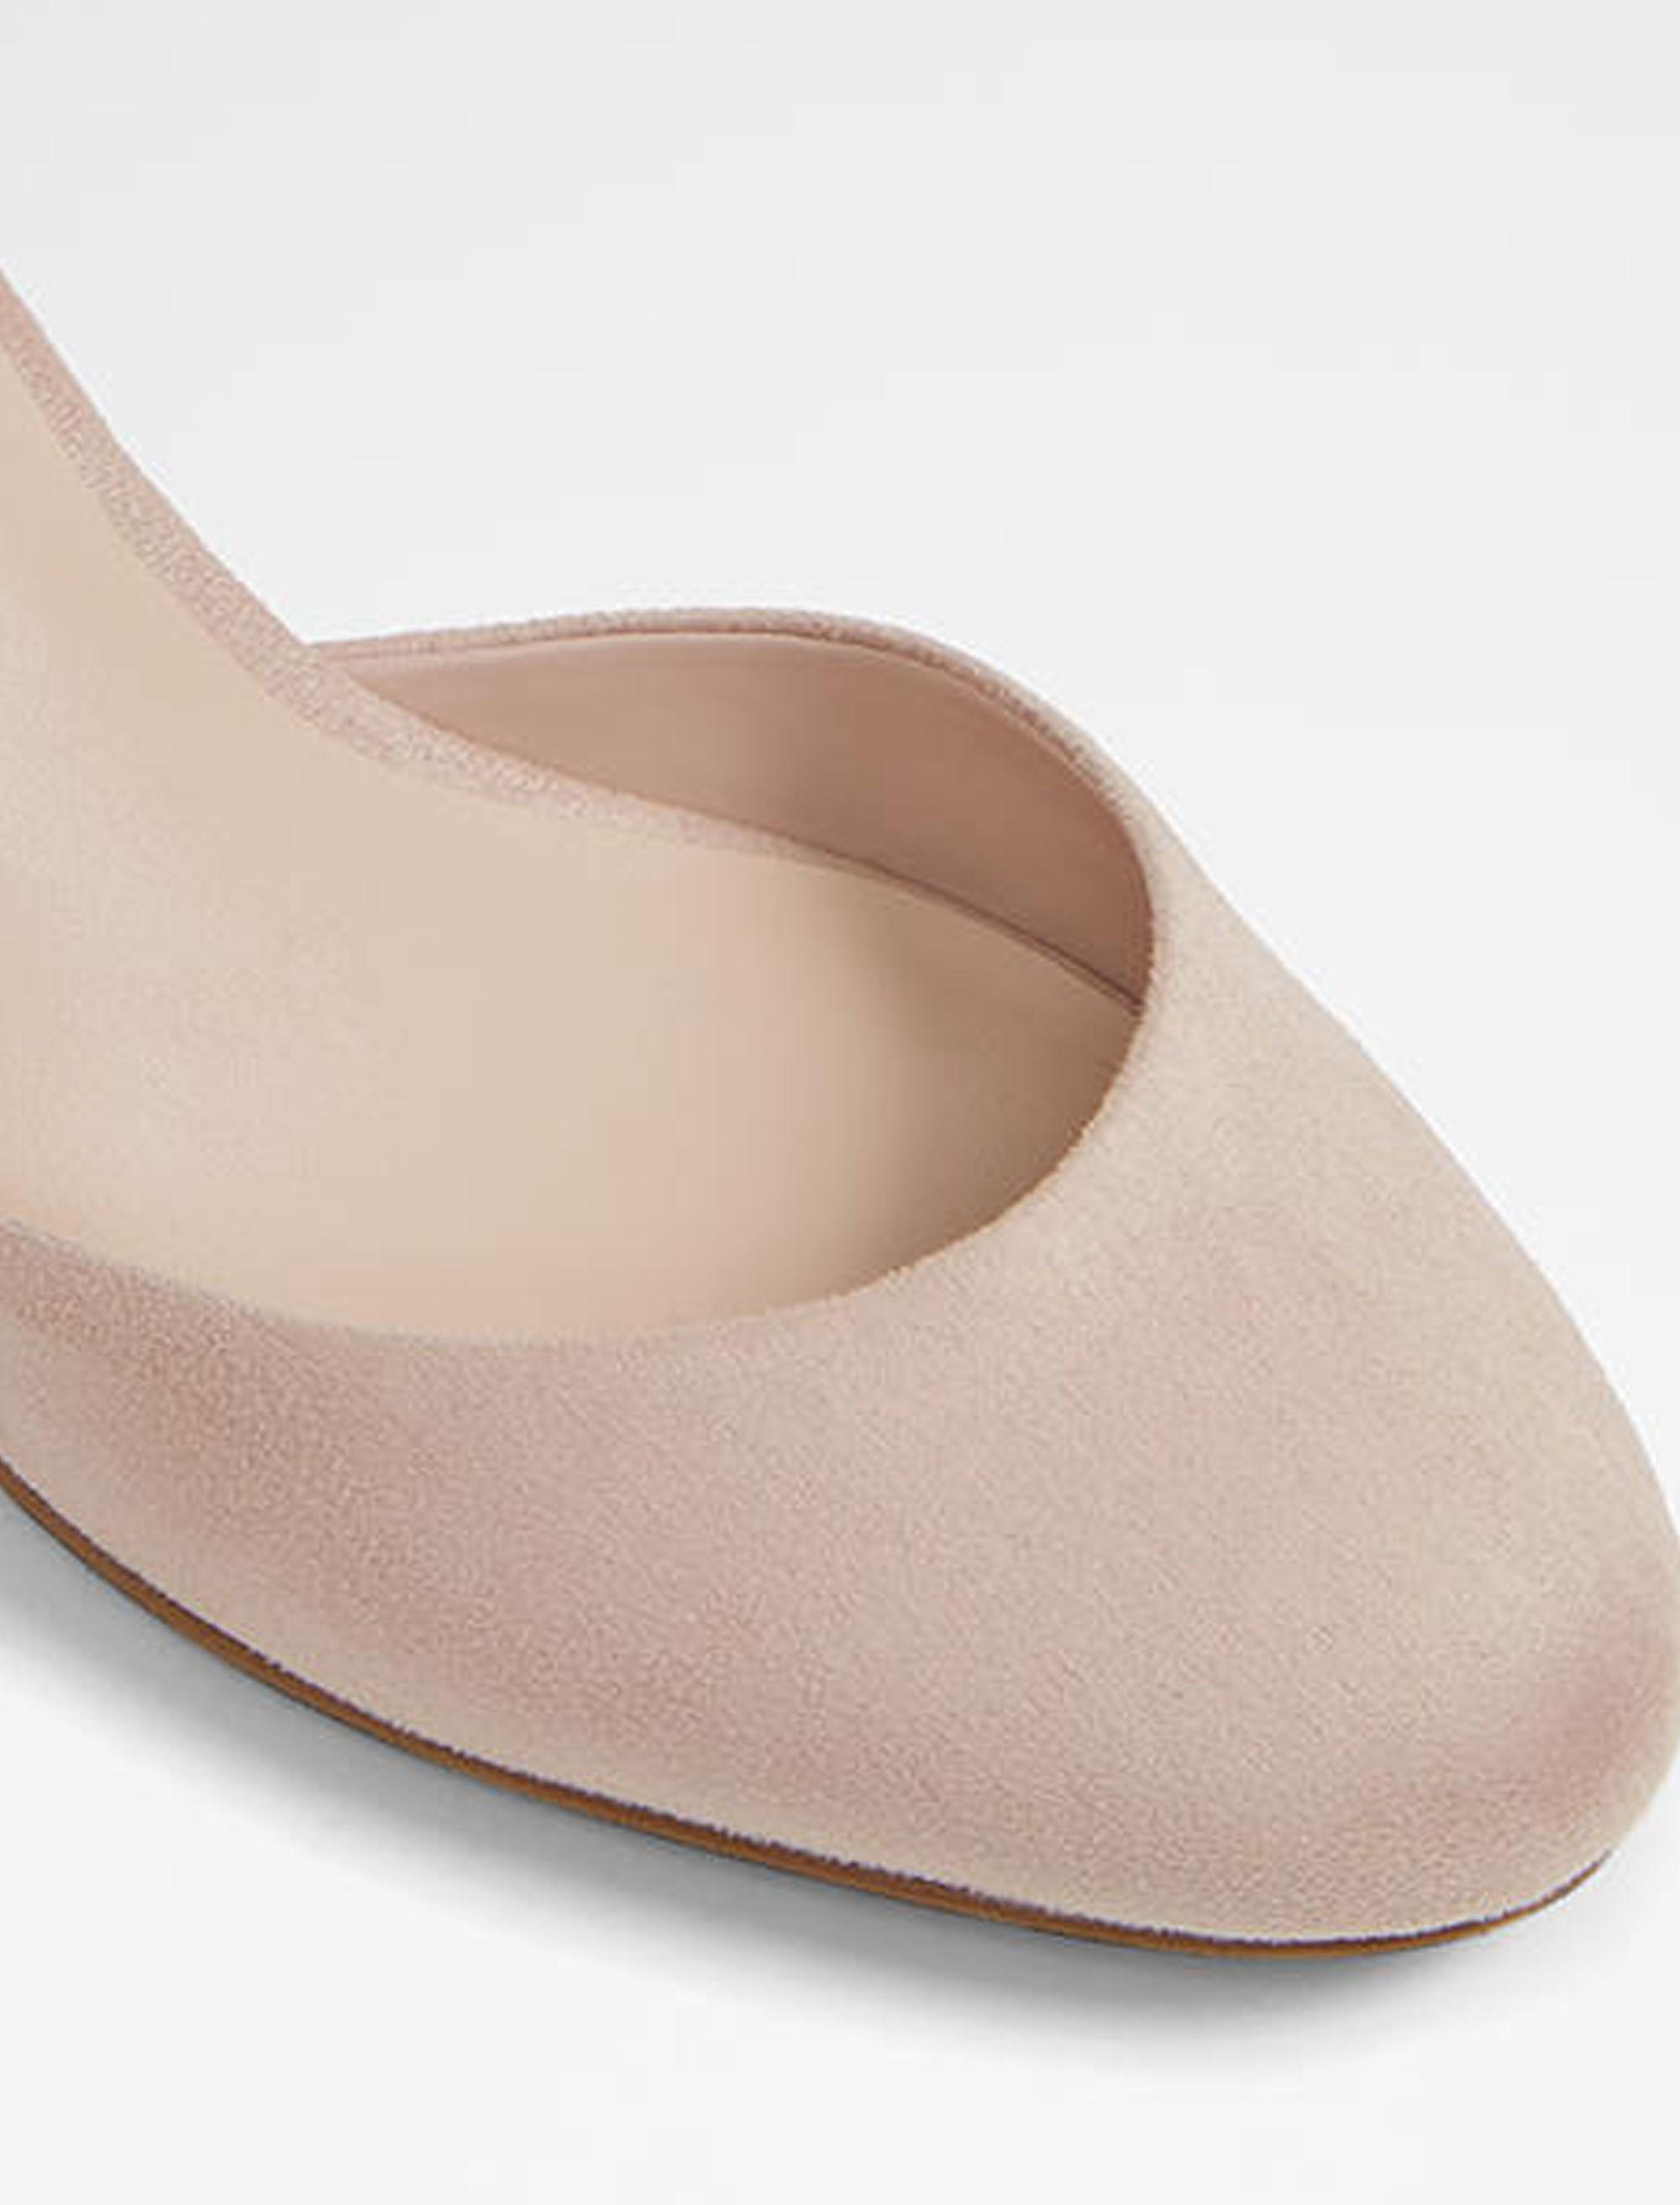 کفش پاشنه دار زنانه - آلدو - صورتي - 4